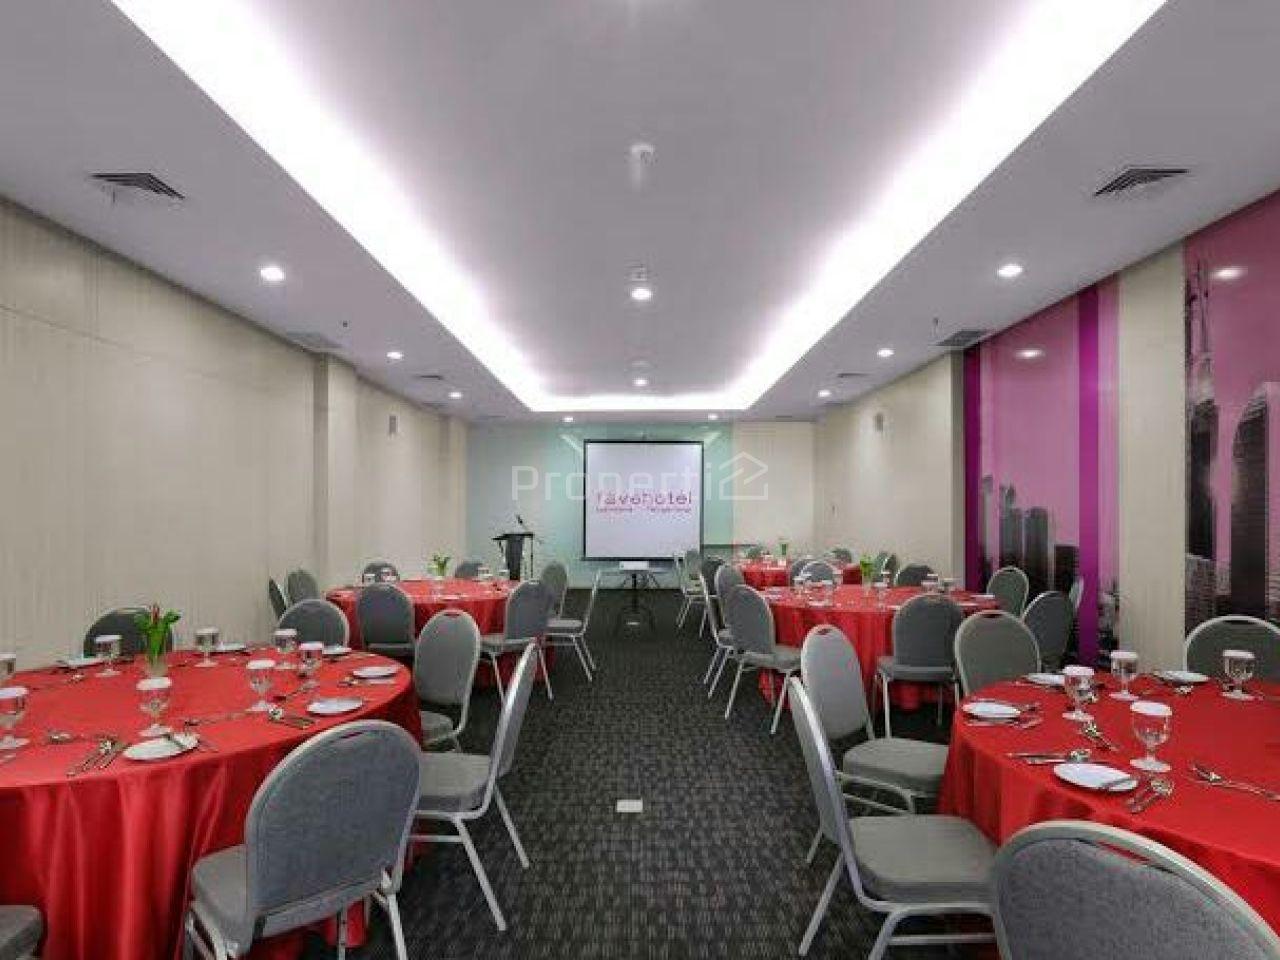 Hotel Berbintang di Kawasan Bandara Soekarno Hatta, Kota Tangerang